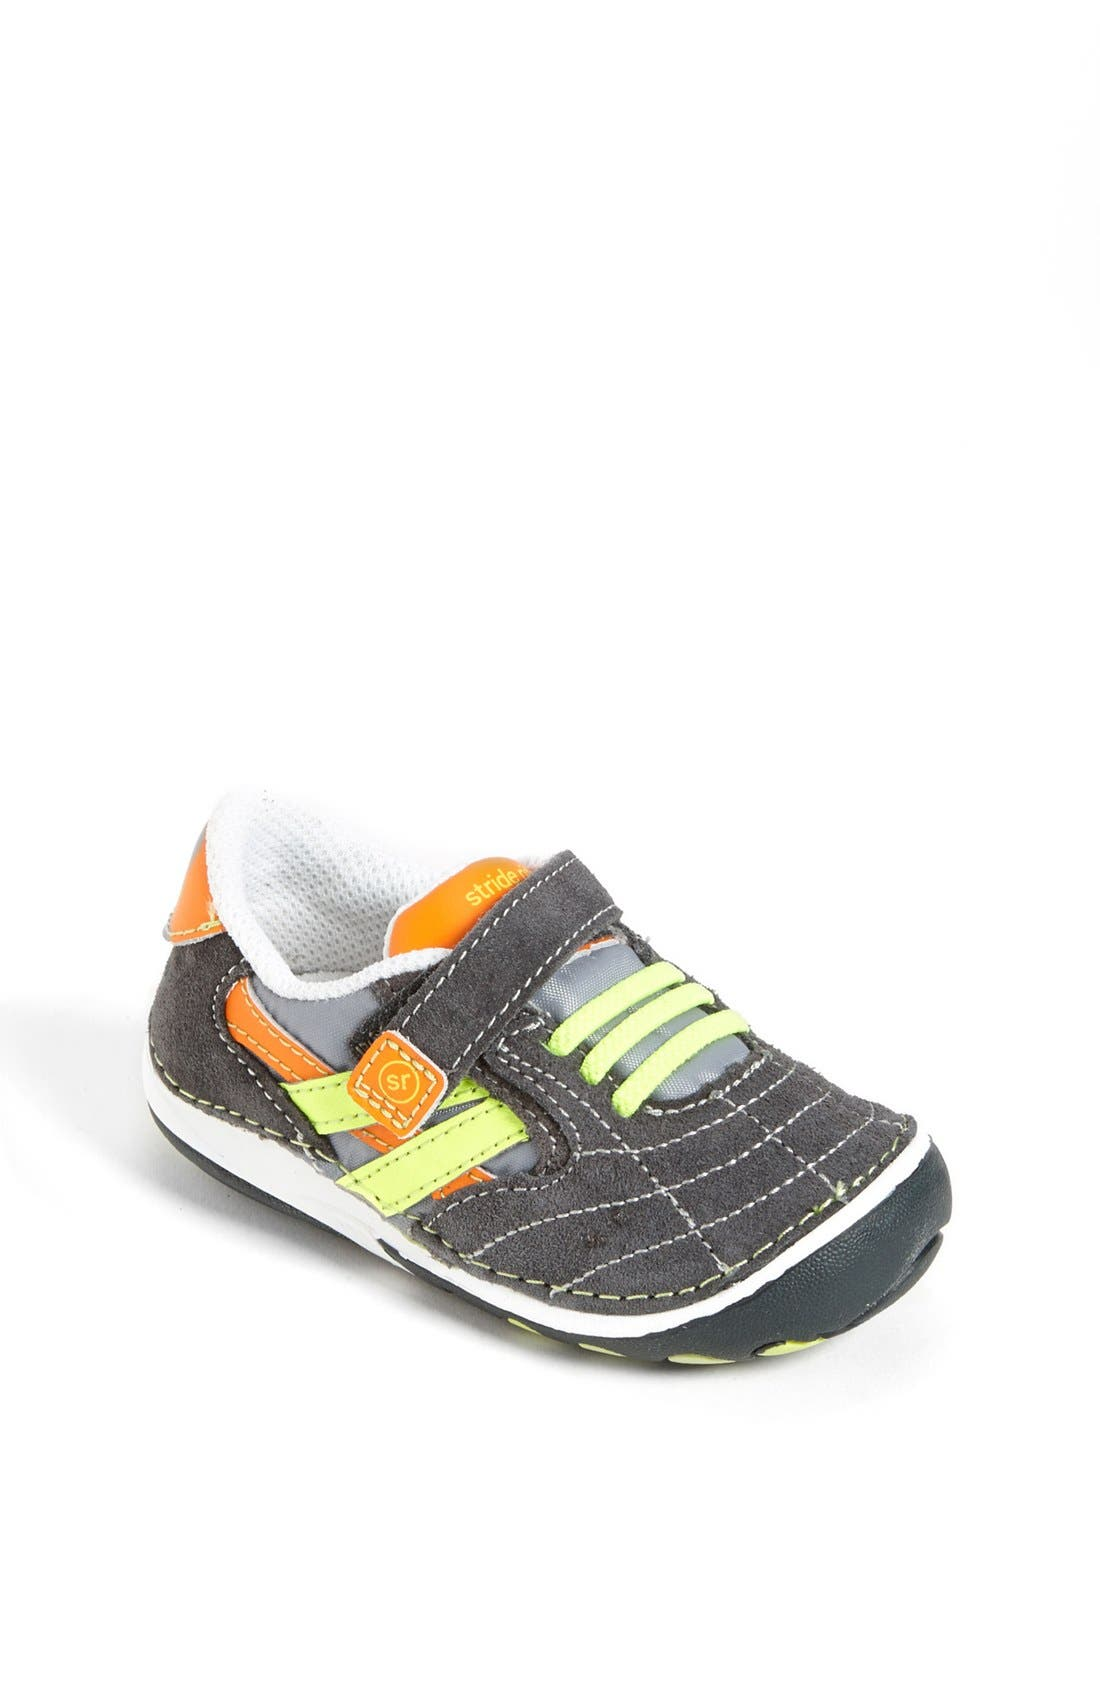 Main Image - Stride Rite 'Jason' Sneaker (Baby & Walker)